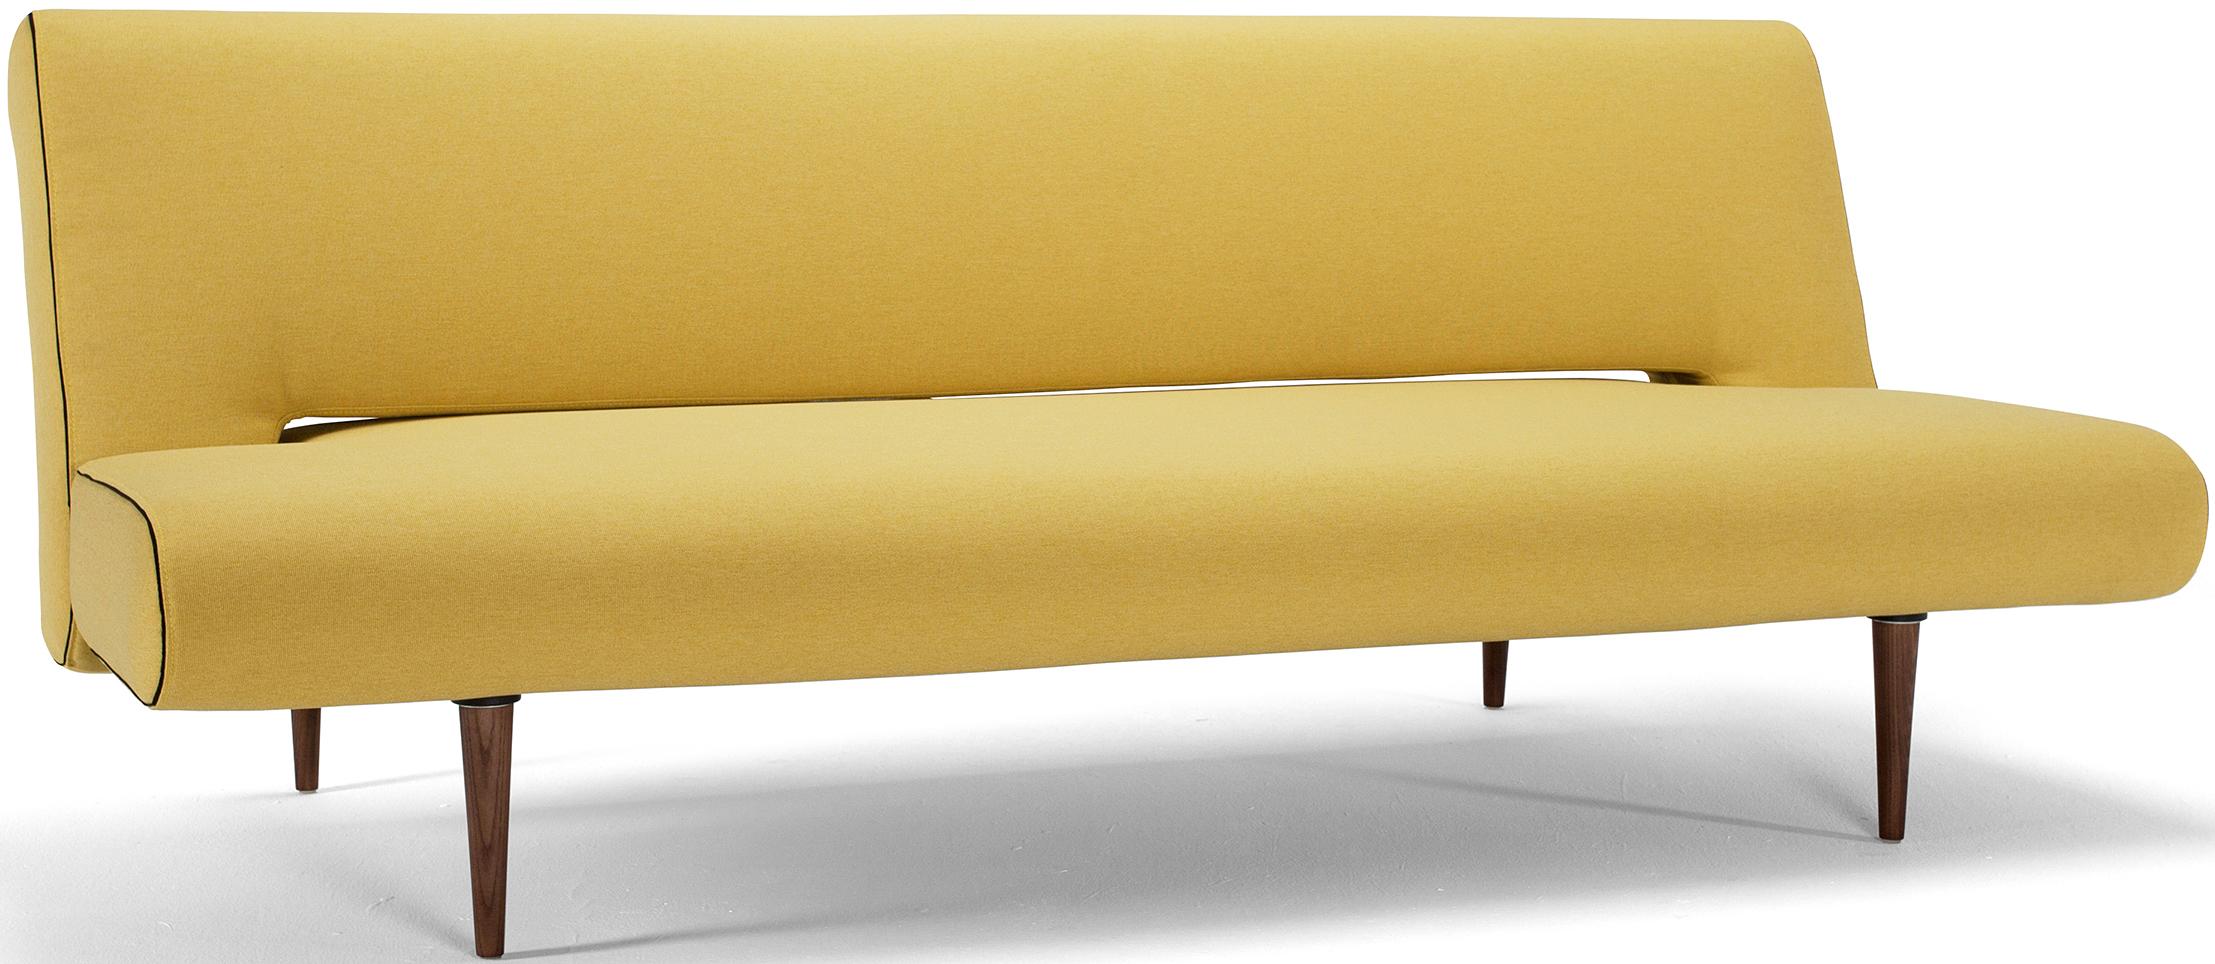 unfurl sofa bed soft mustard yellow